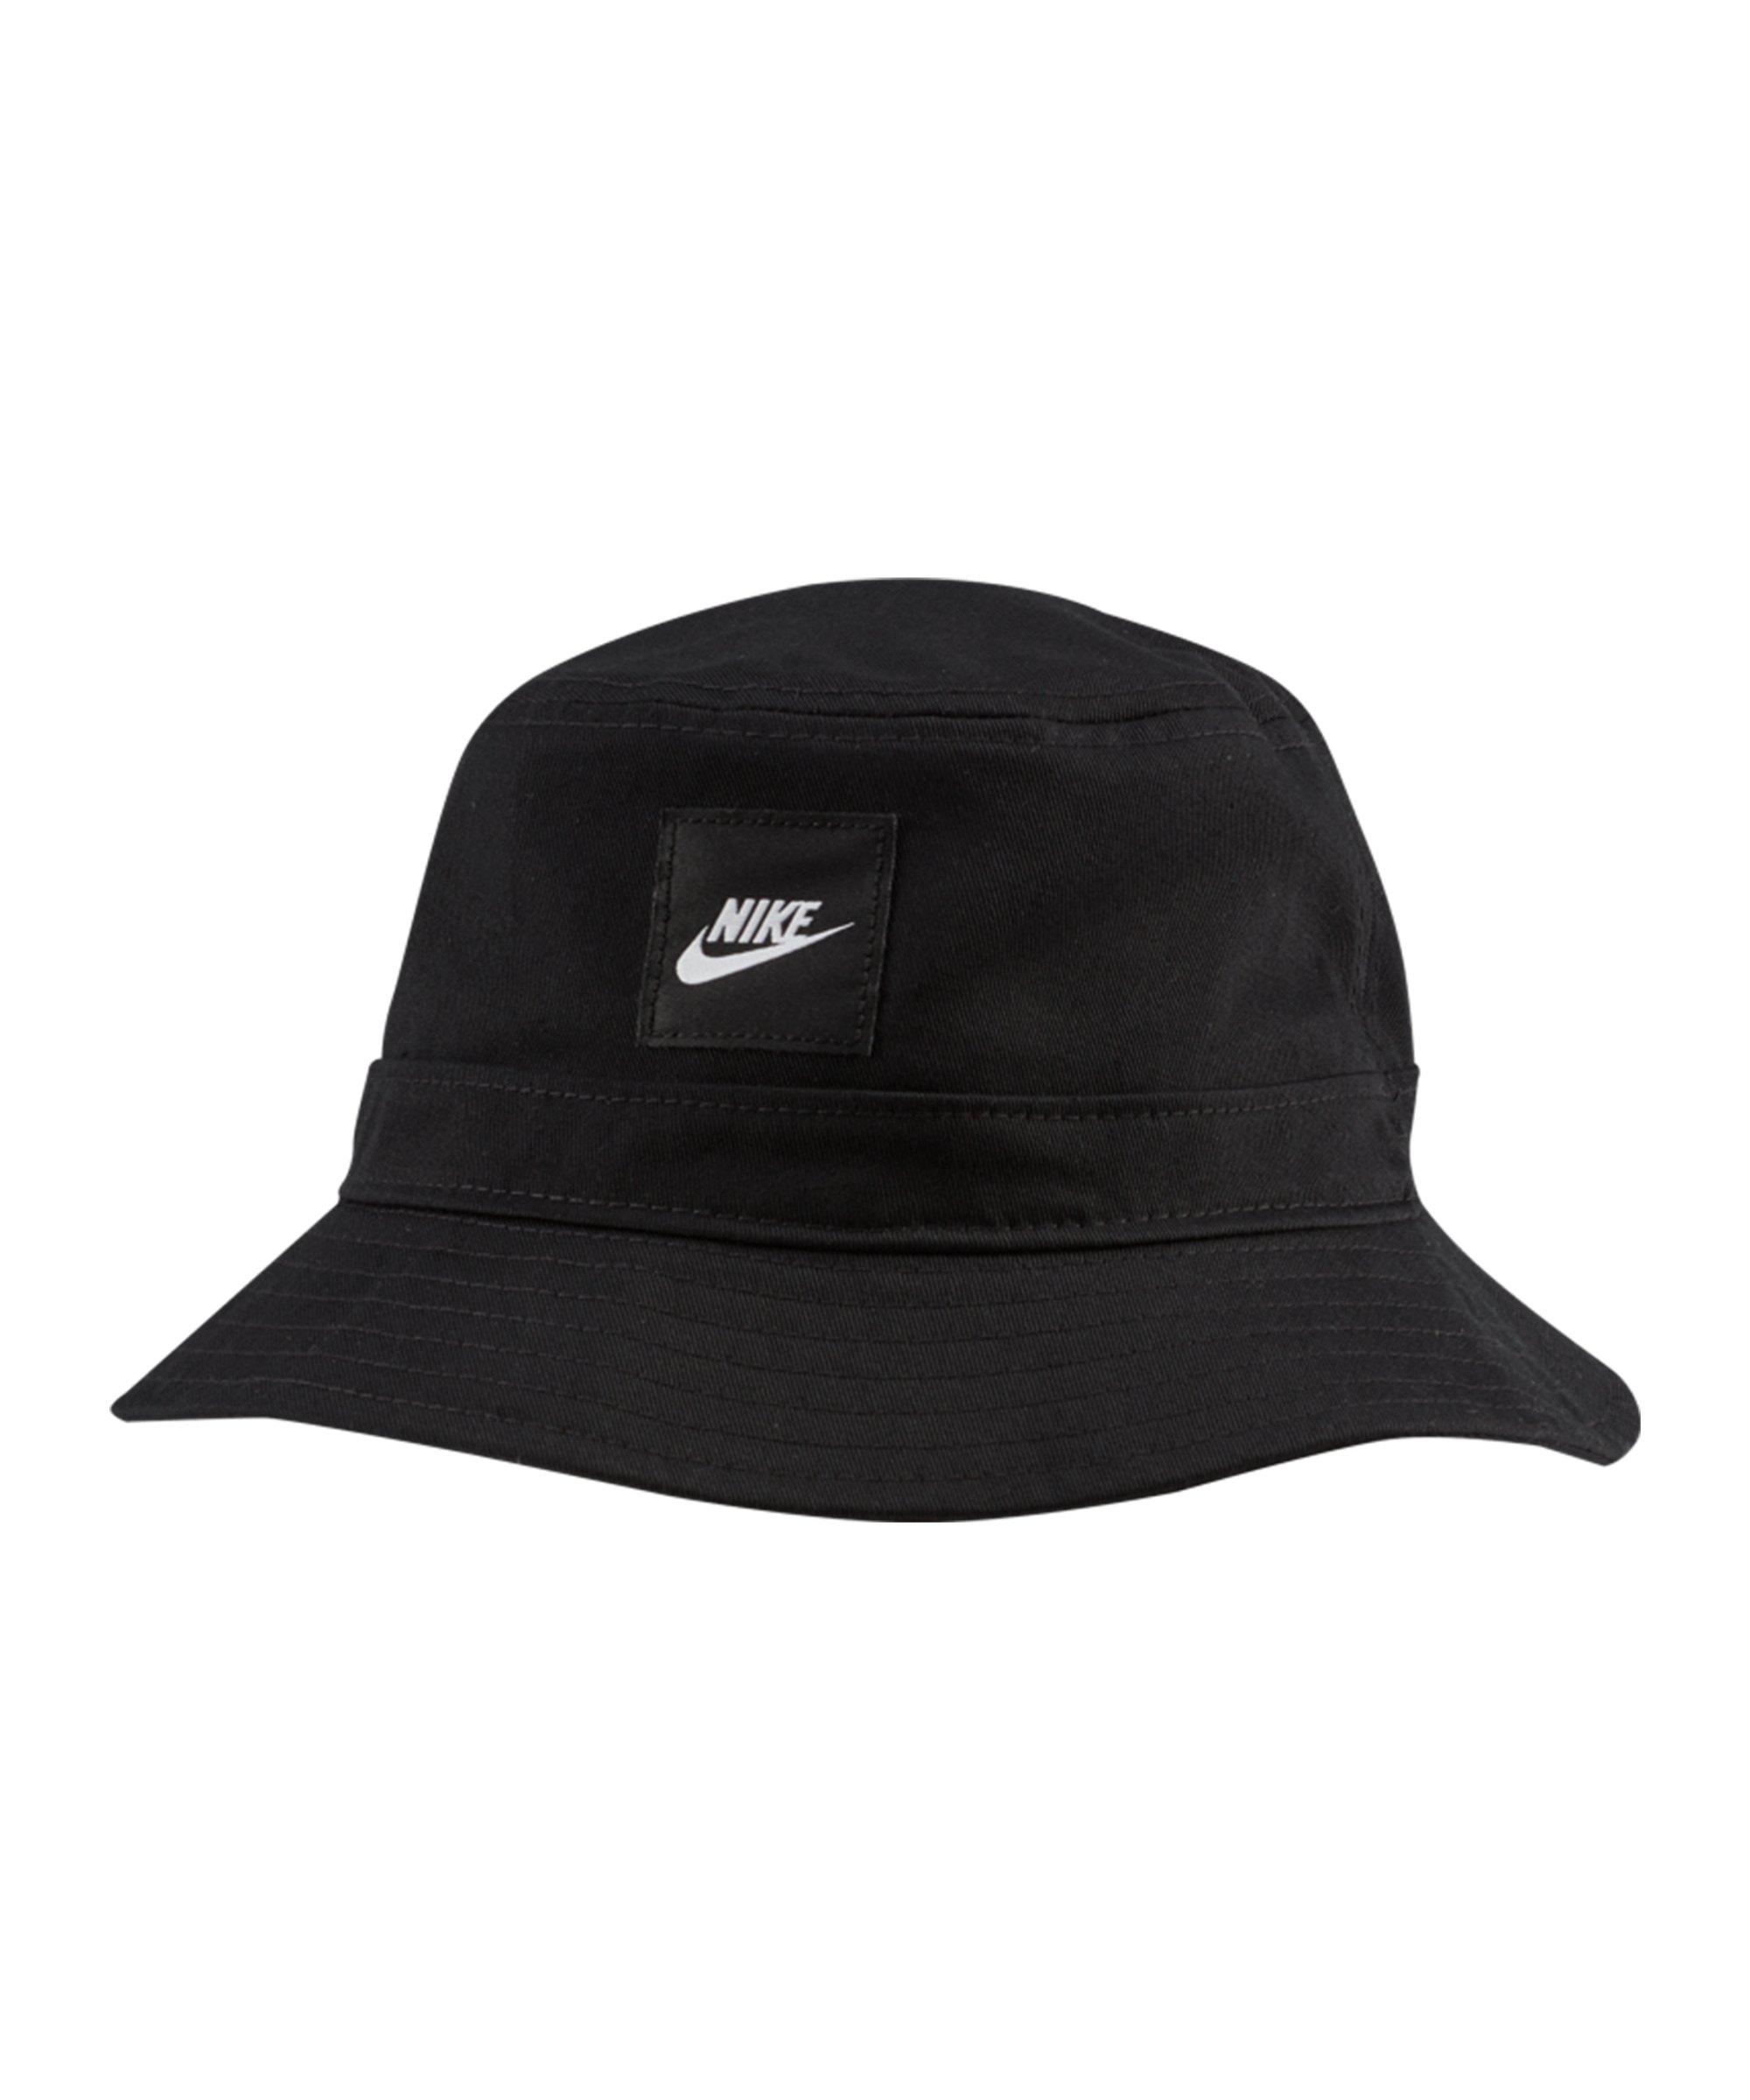 Nike Core Bucket Hat Schwarz F010 - schwarz